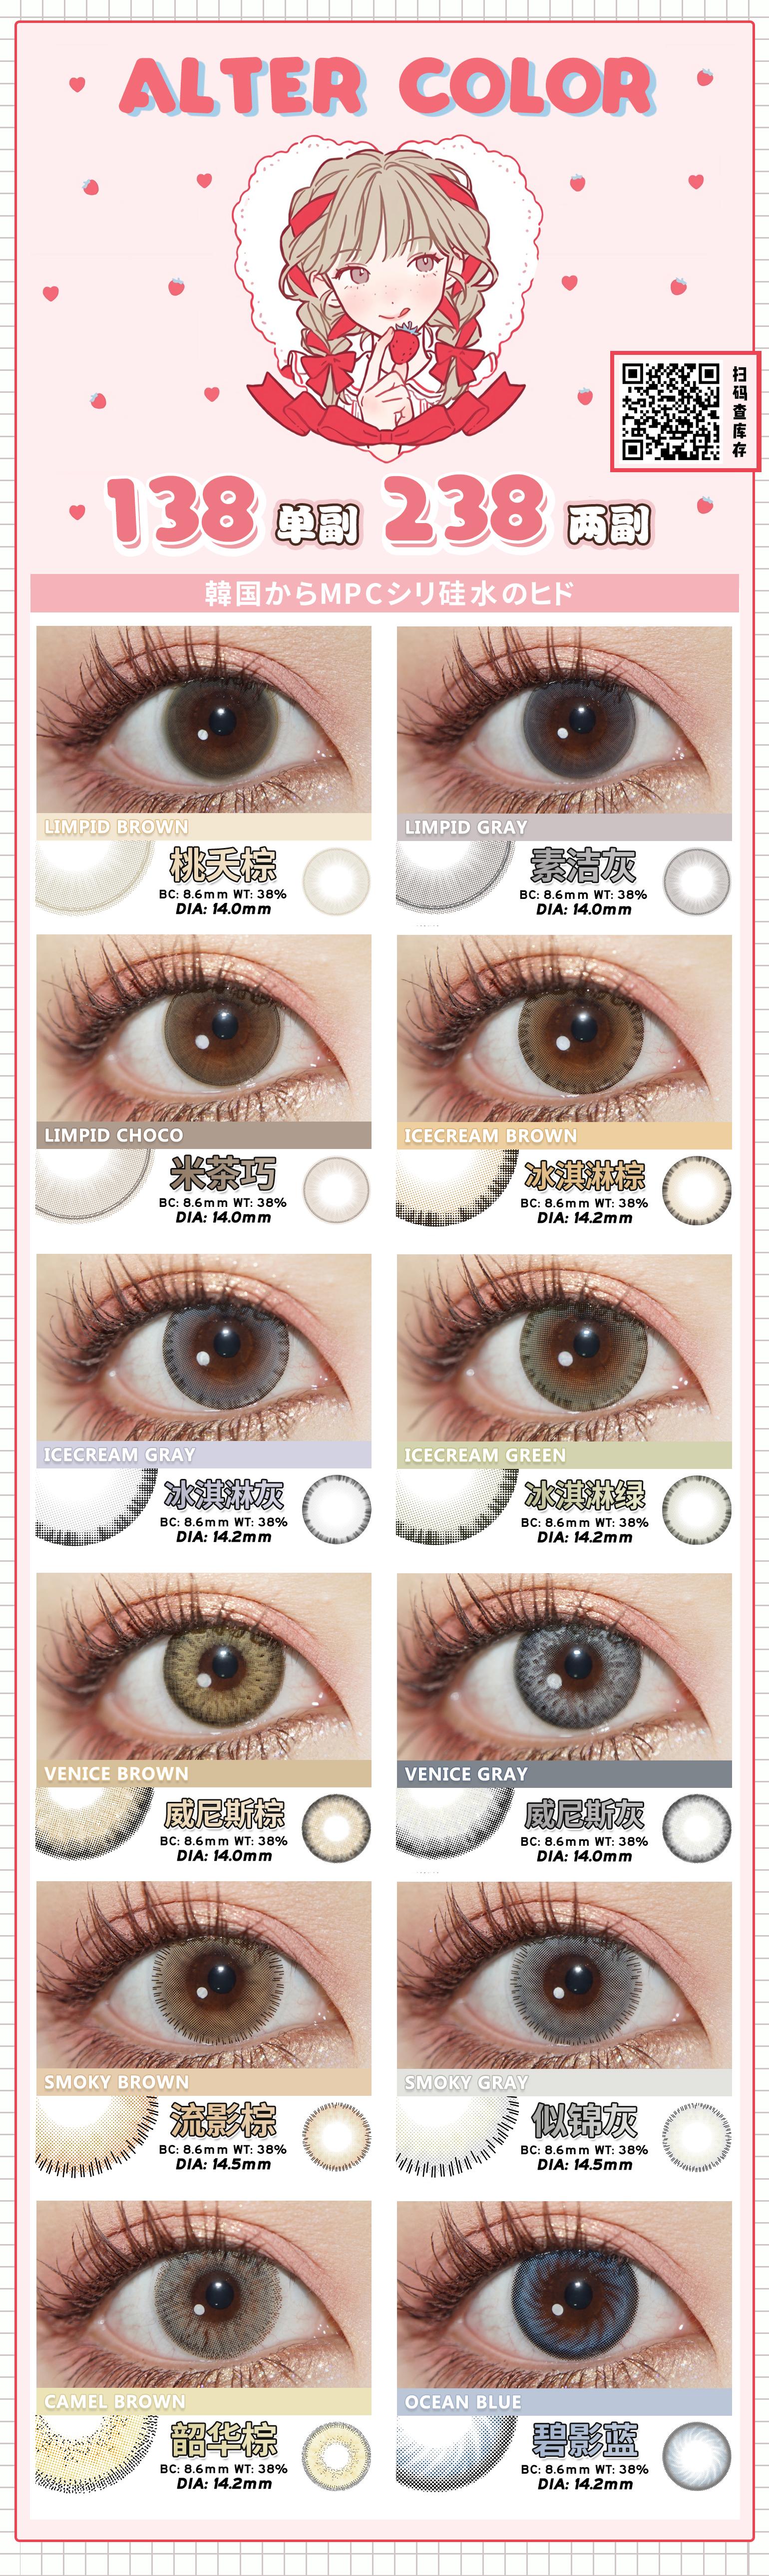 altercolor美瞳 正价长期活动